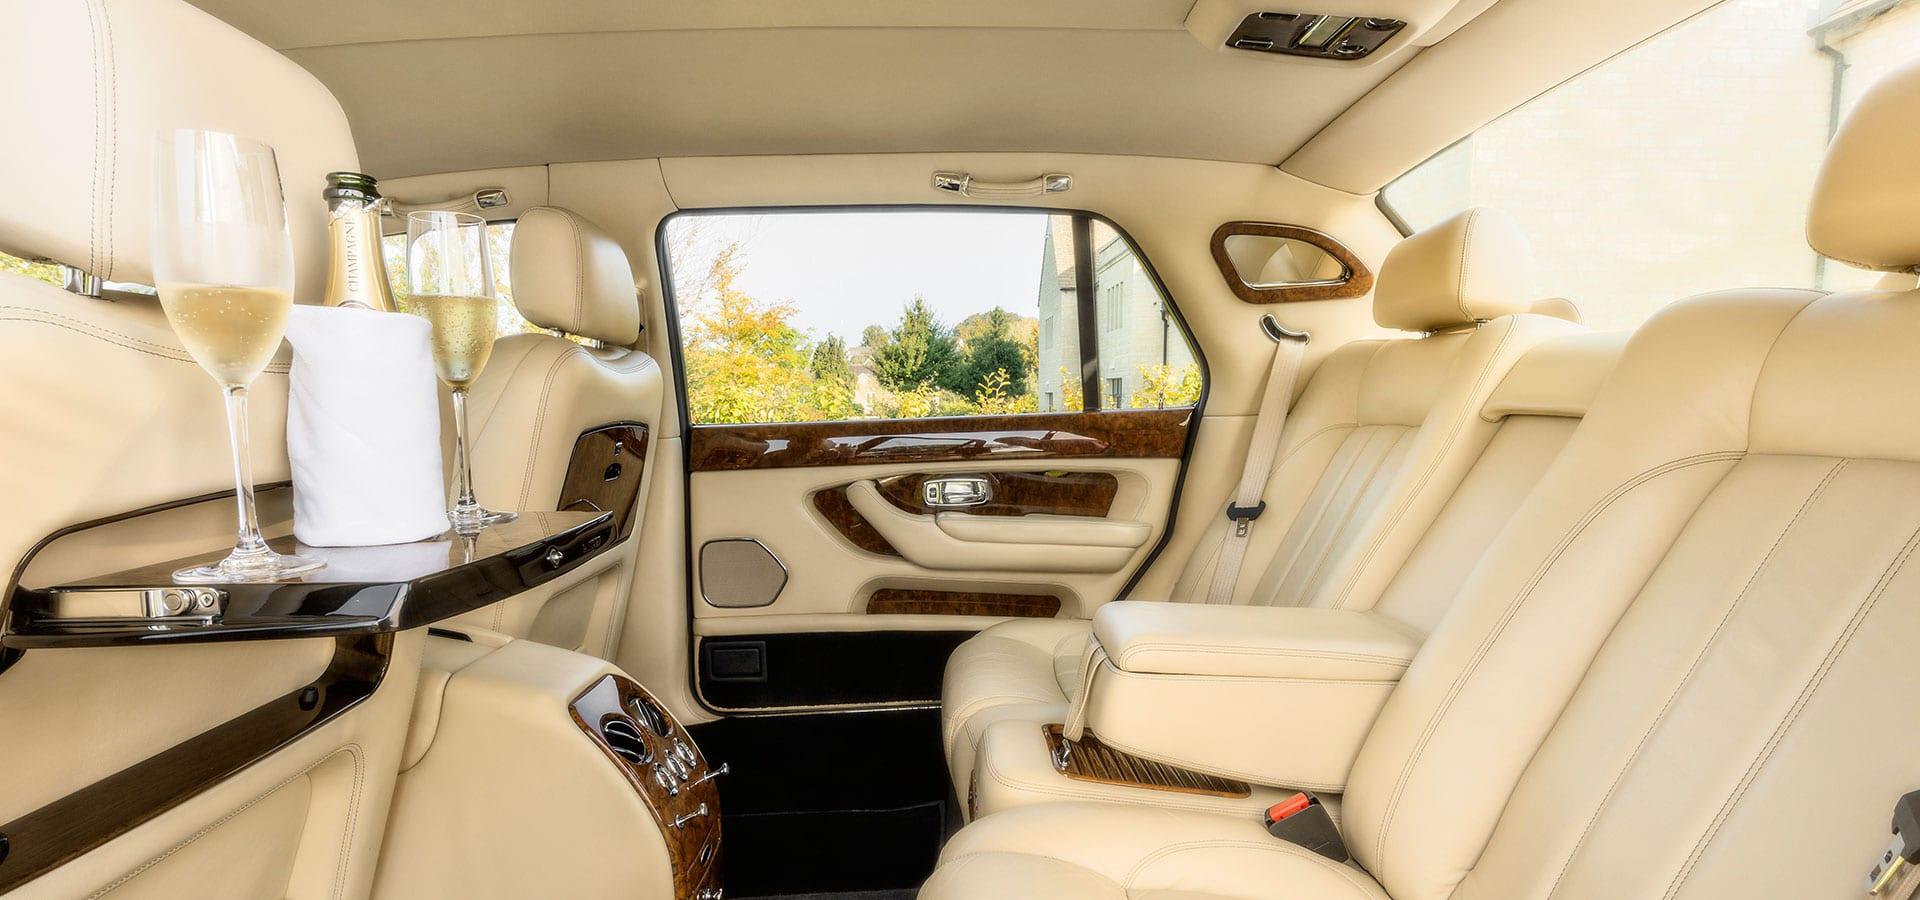 Bentley Arnage wedding car with large leg room space